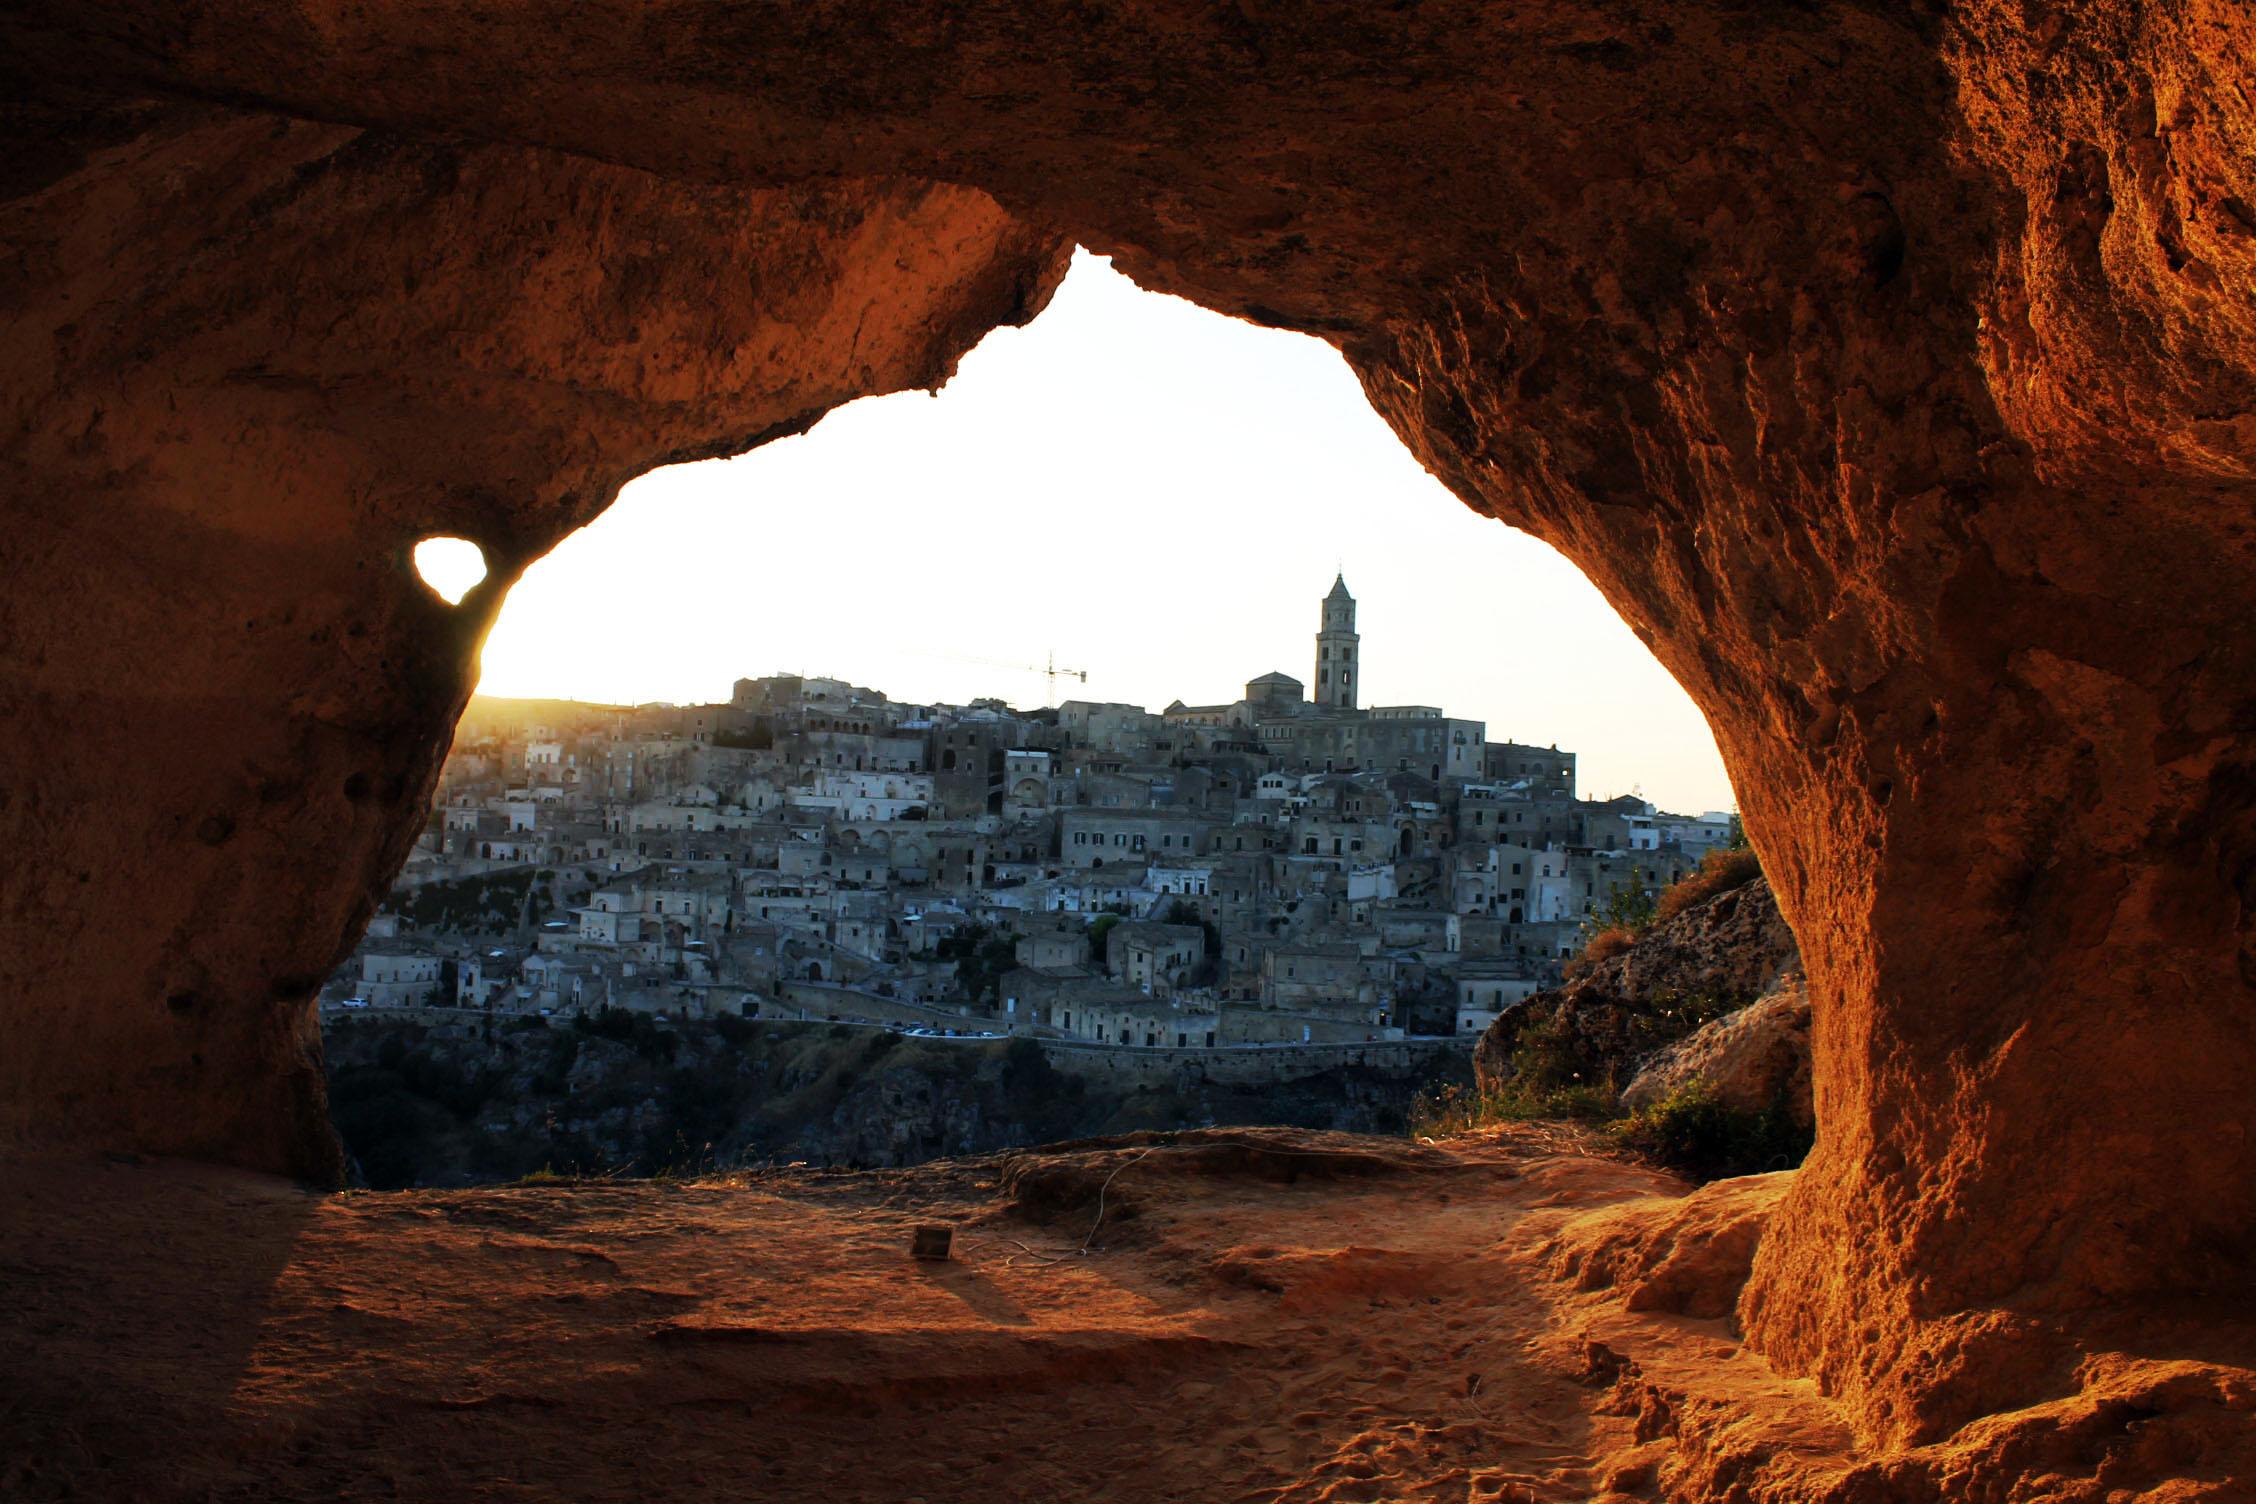 Cave Matera - photo credit: Maryn ve